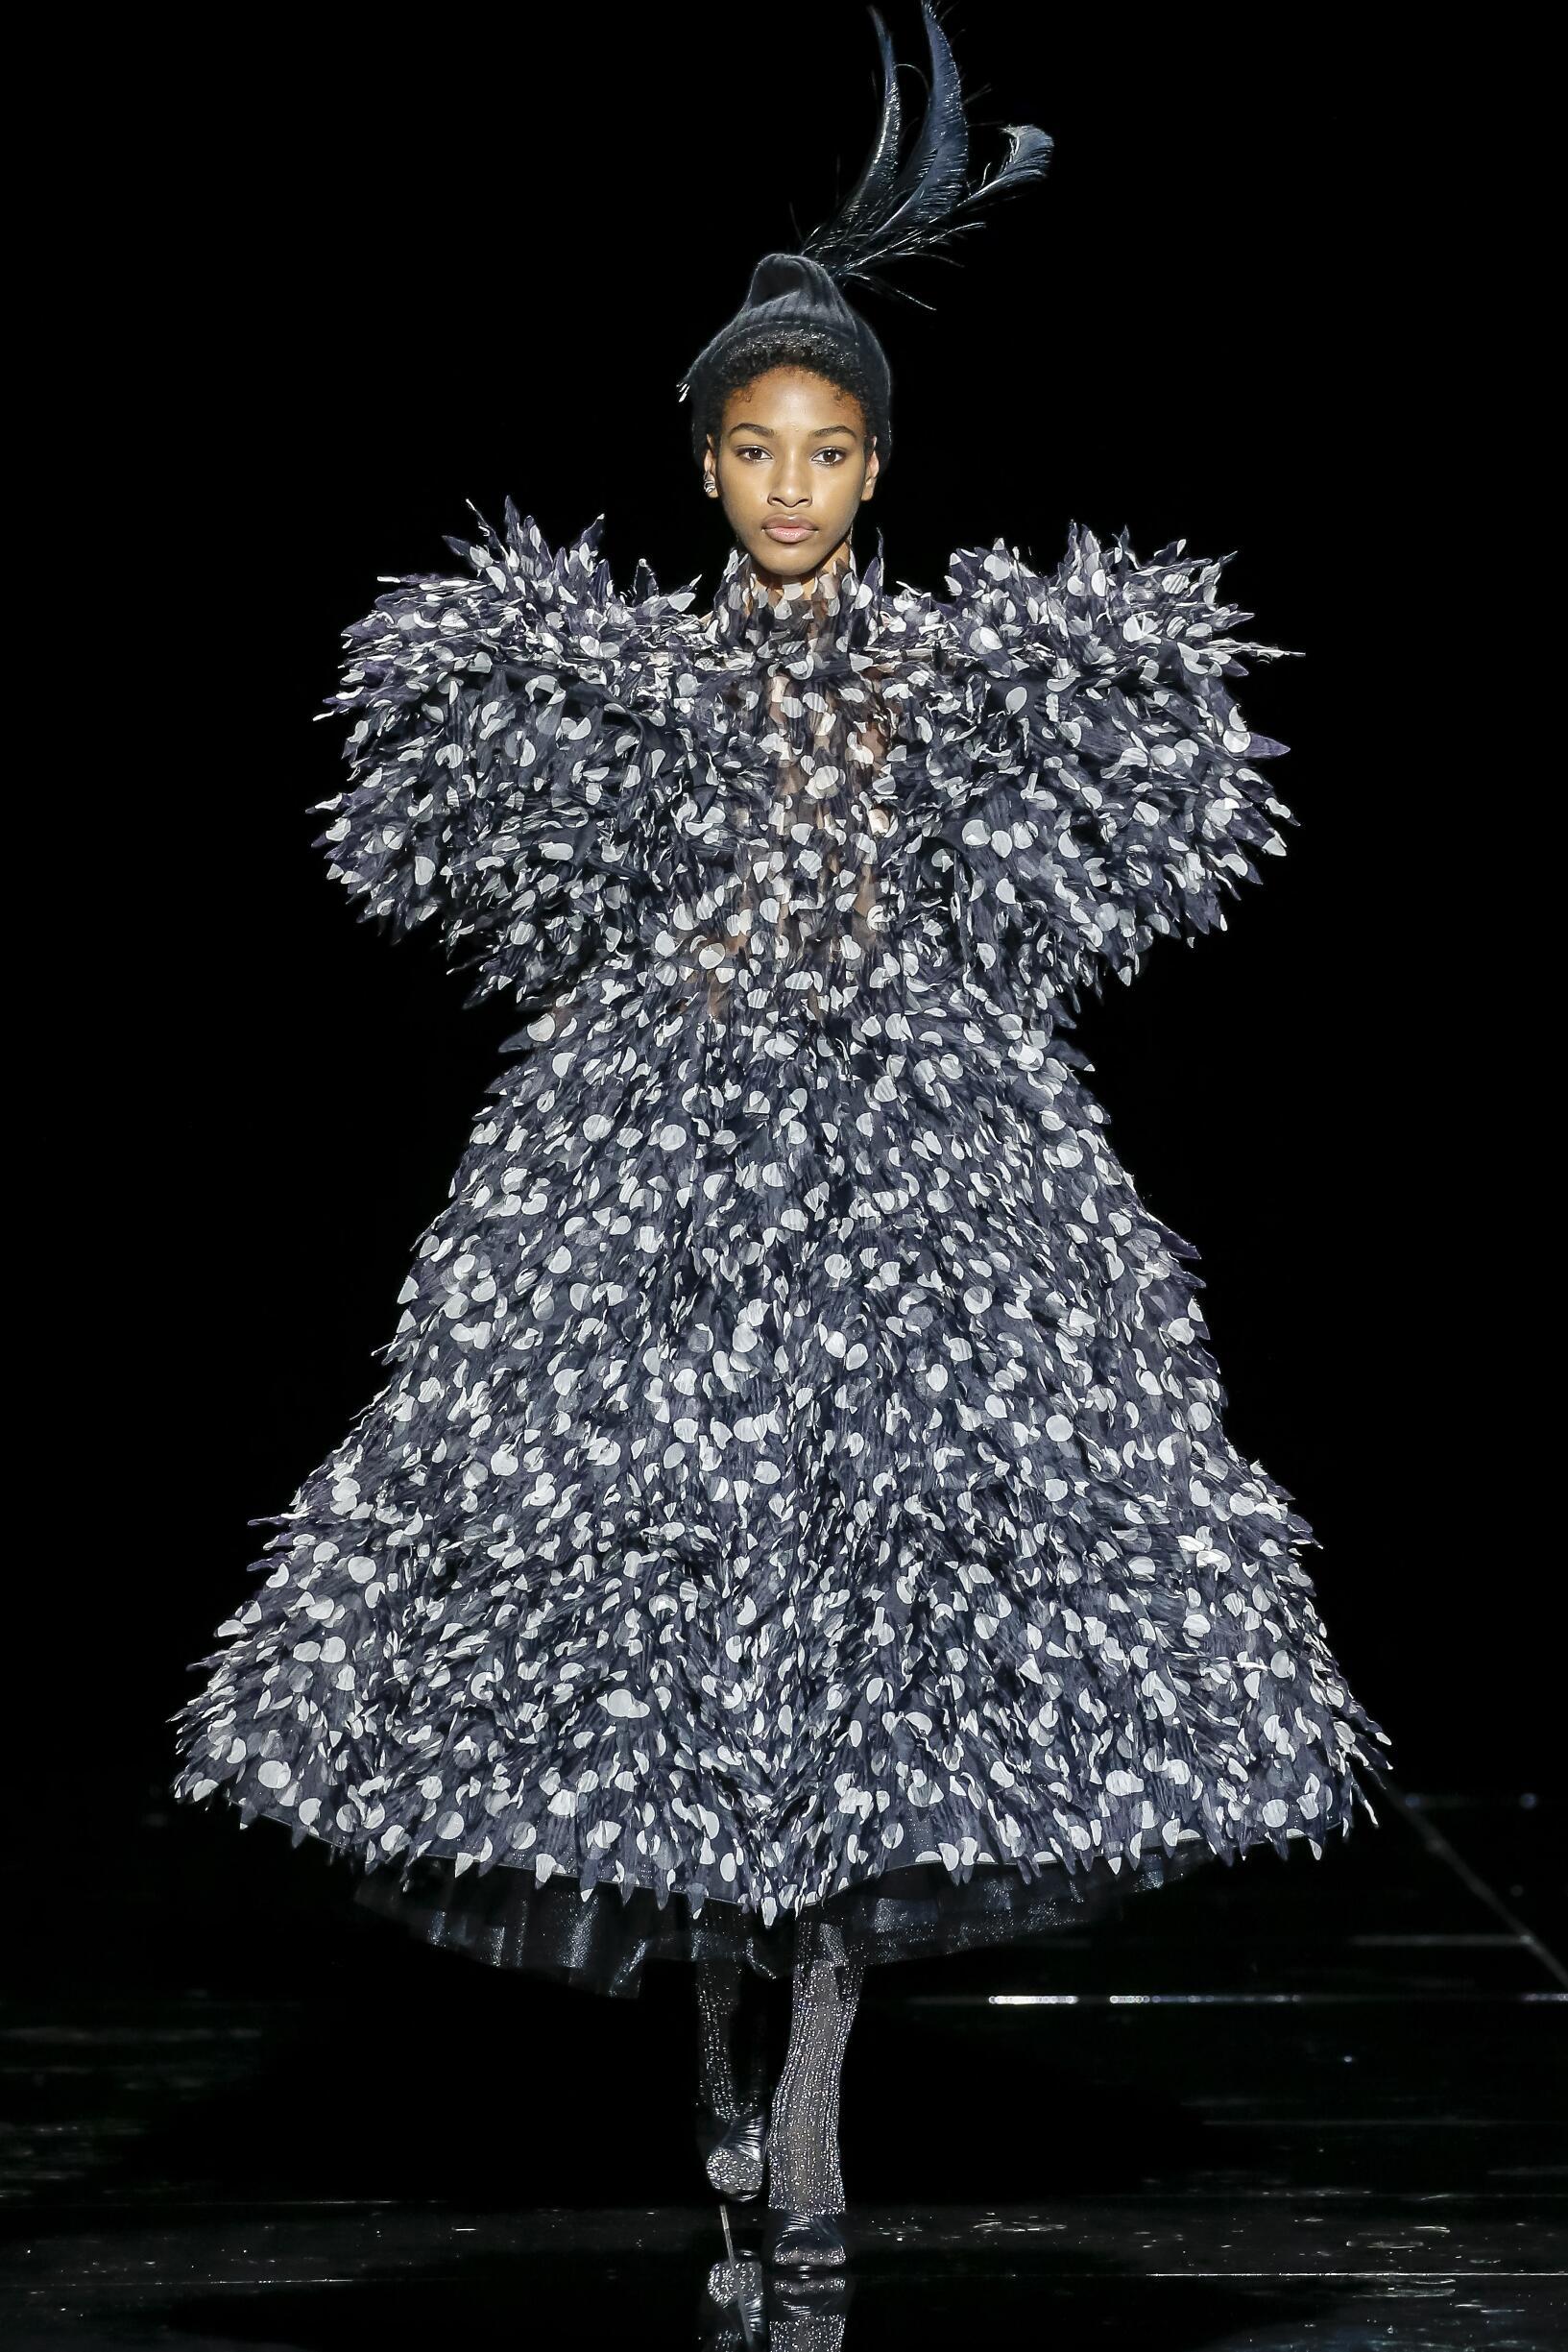 Catwalk Marc Jacobs Woman Fashion Show Winter 2019